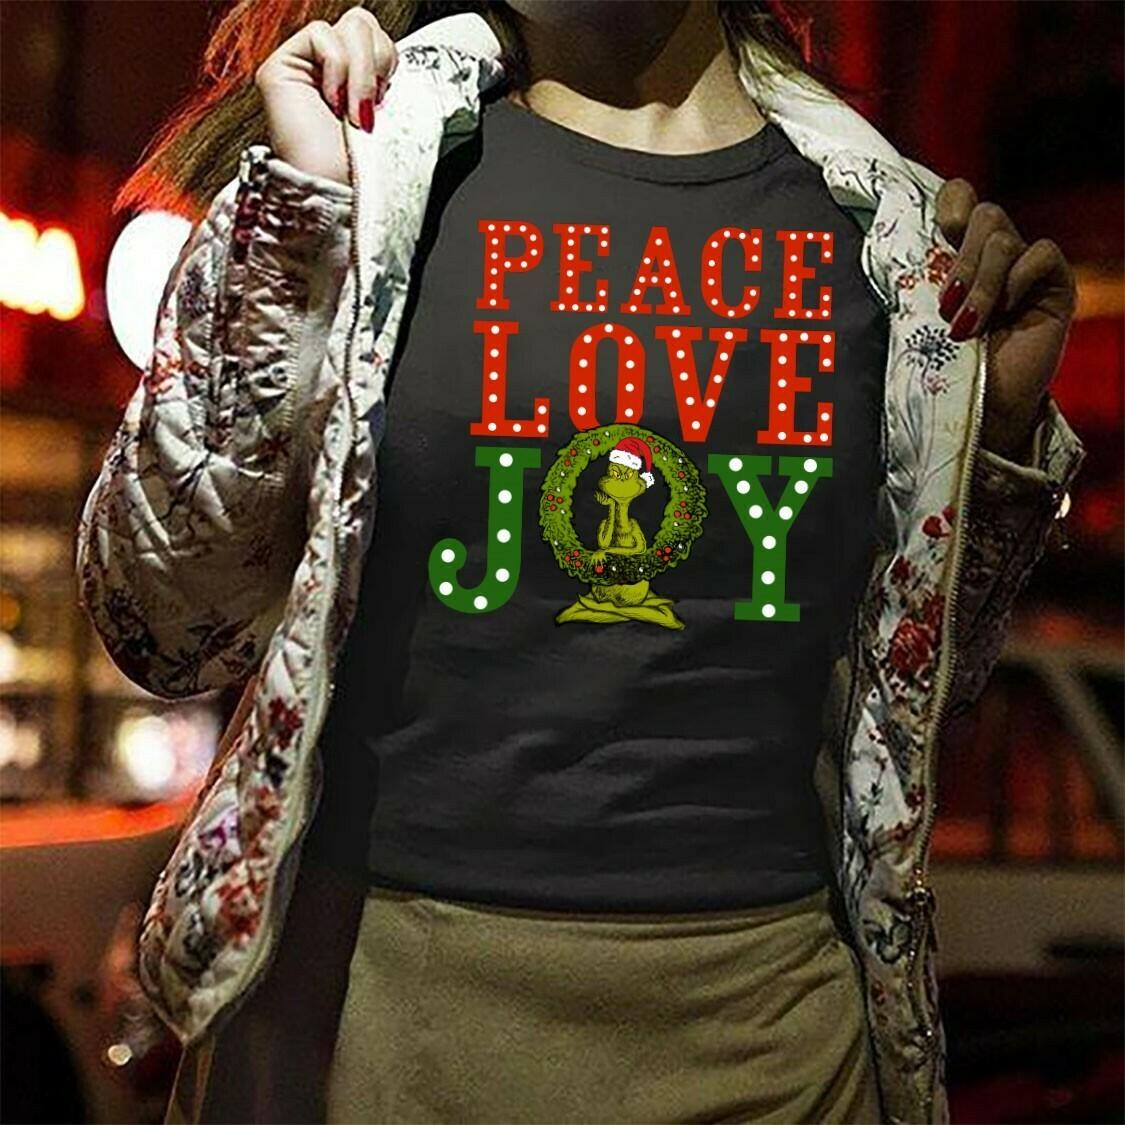 Peace Joy & Love Grinch Christmas,Christian Religious Faith Jesus,HYGGE - Rustic Love Peace Joy Sack Burlap Tê T-Shirts Long Sleeve Sweatshirt Hoodie Jolly Family Gifts